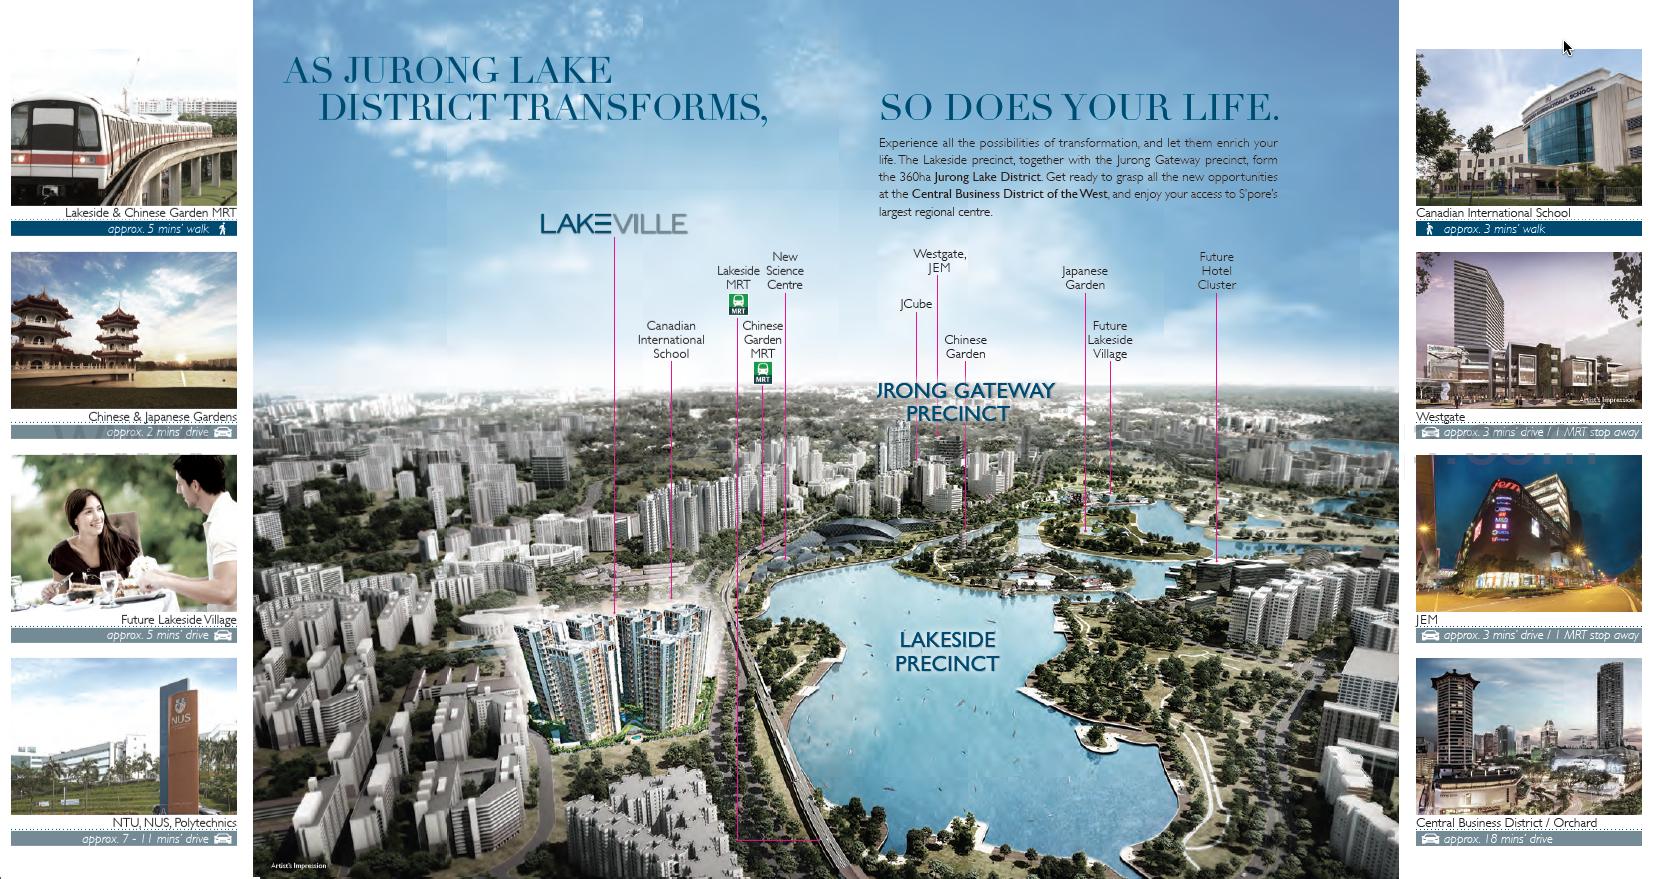 lakeville Jurong Lakeside Precinct lakeville Lakeville by MCL Land | Showflat Hotline +65 61007122 lakeville new launch Lakside Precinct